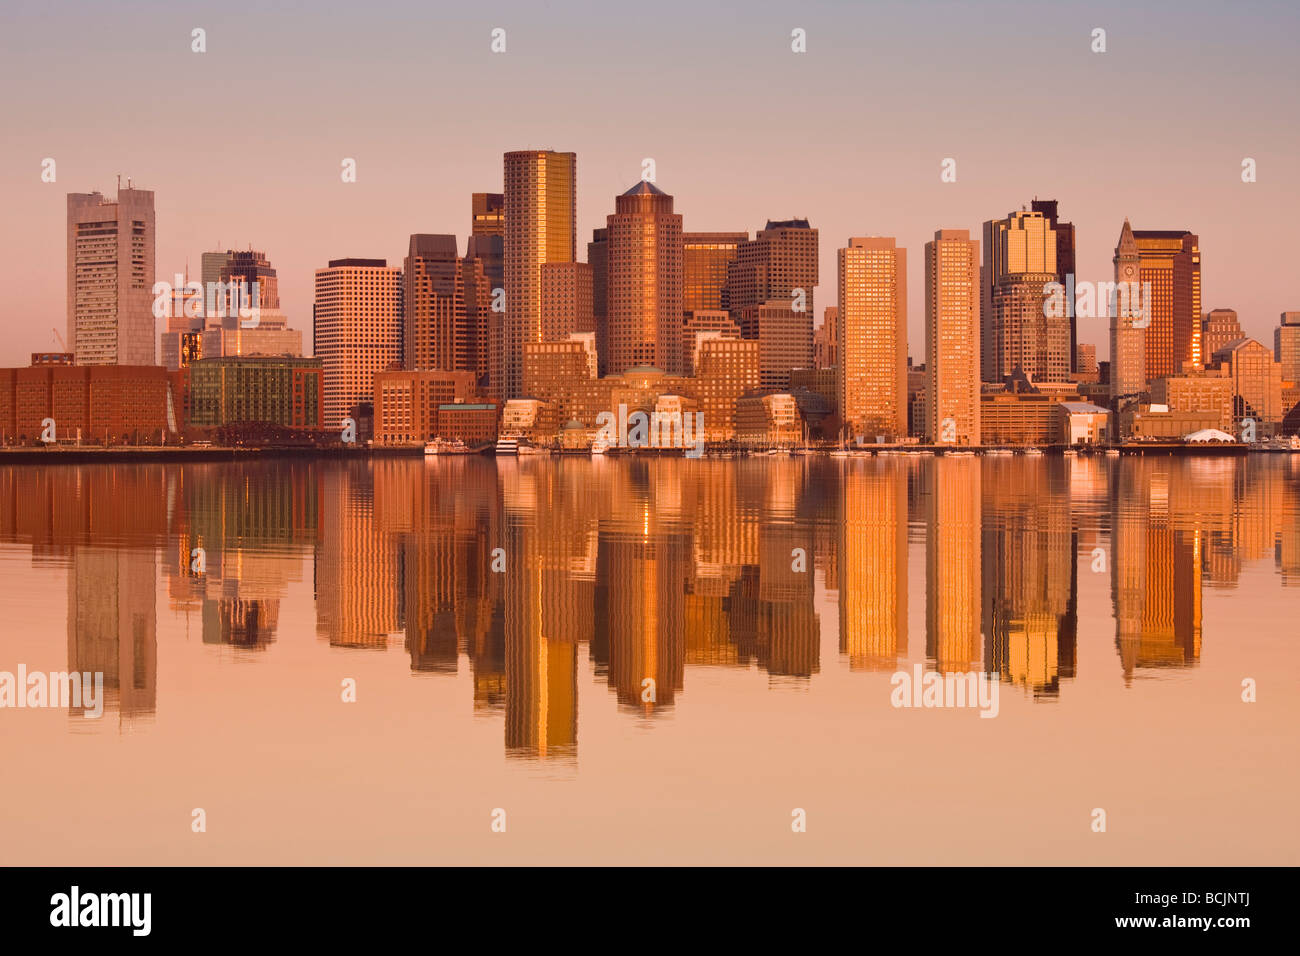 USA, Massachusetts, Boston, Financial District from Logan Airport, East Boston - Stock Image